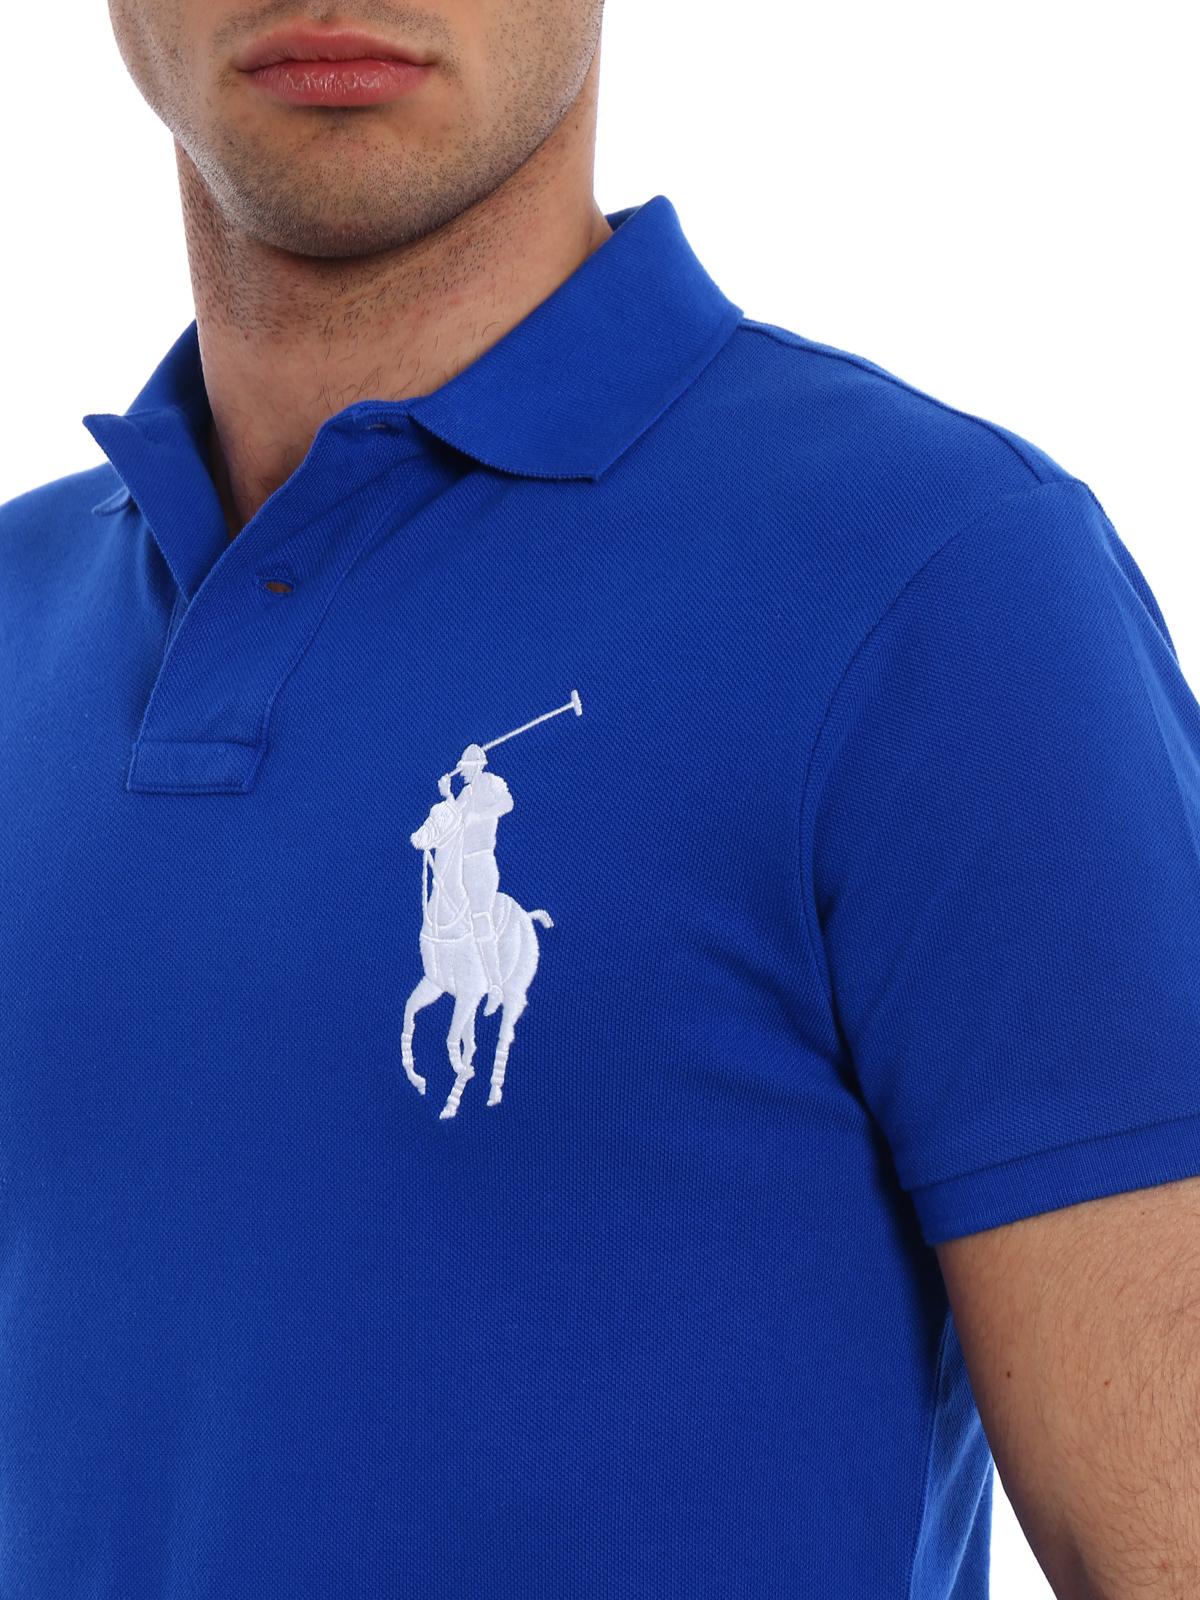 polo ralph lauren established ralph lauren polo shirts online shopping